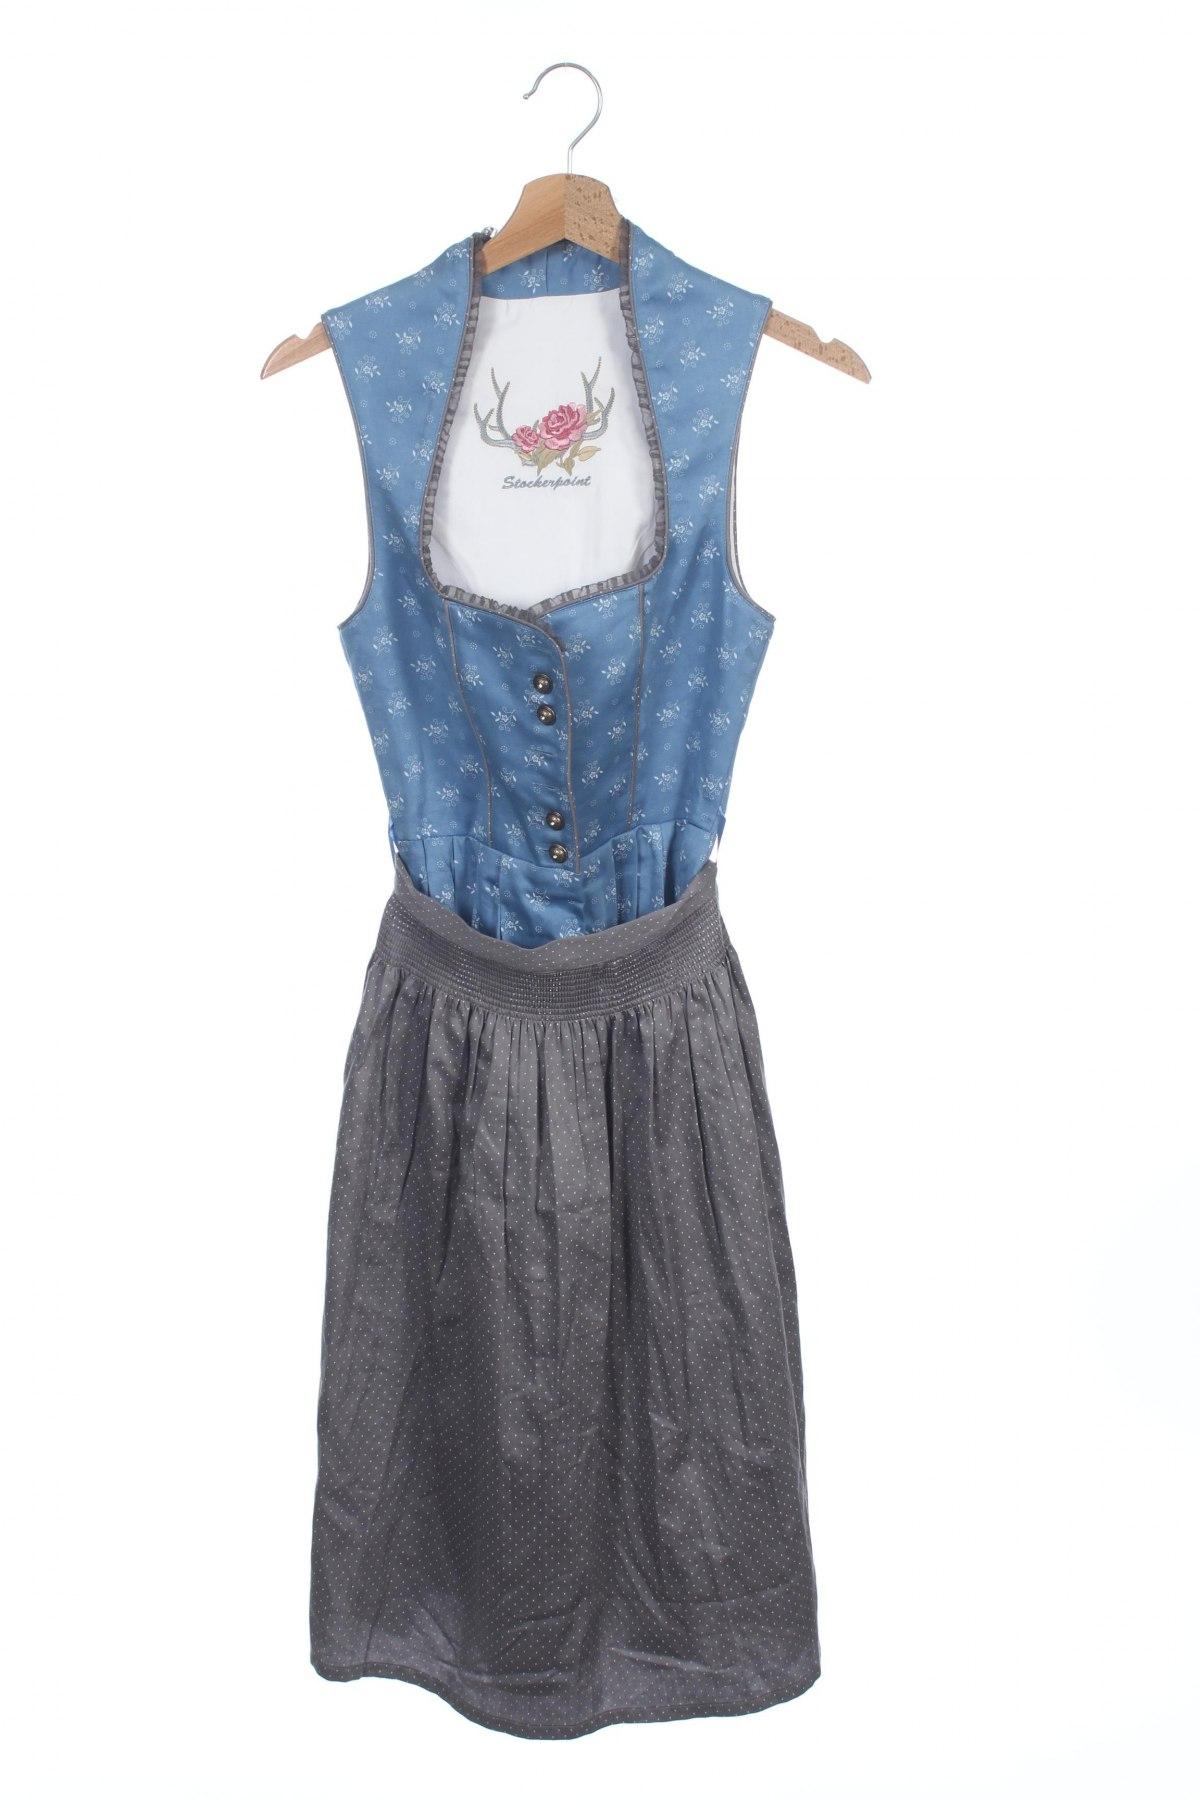 e62f422268 Dámske oblečenie - blúzky